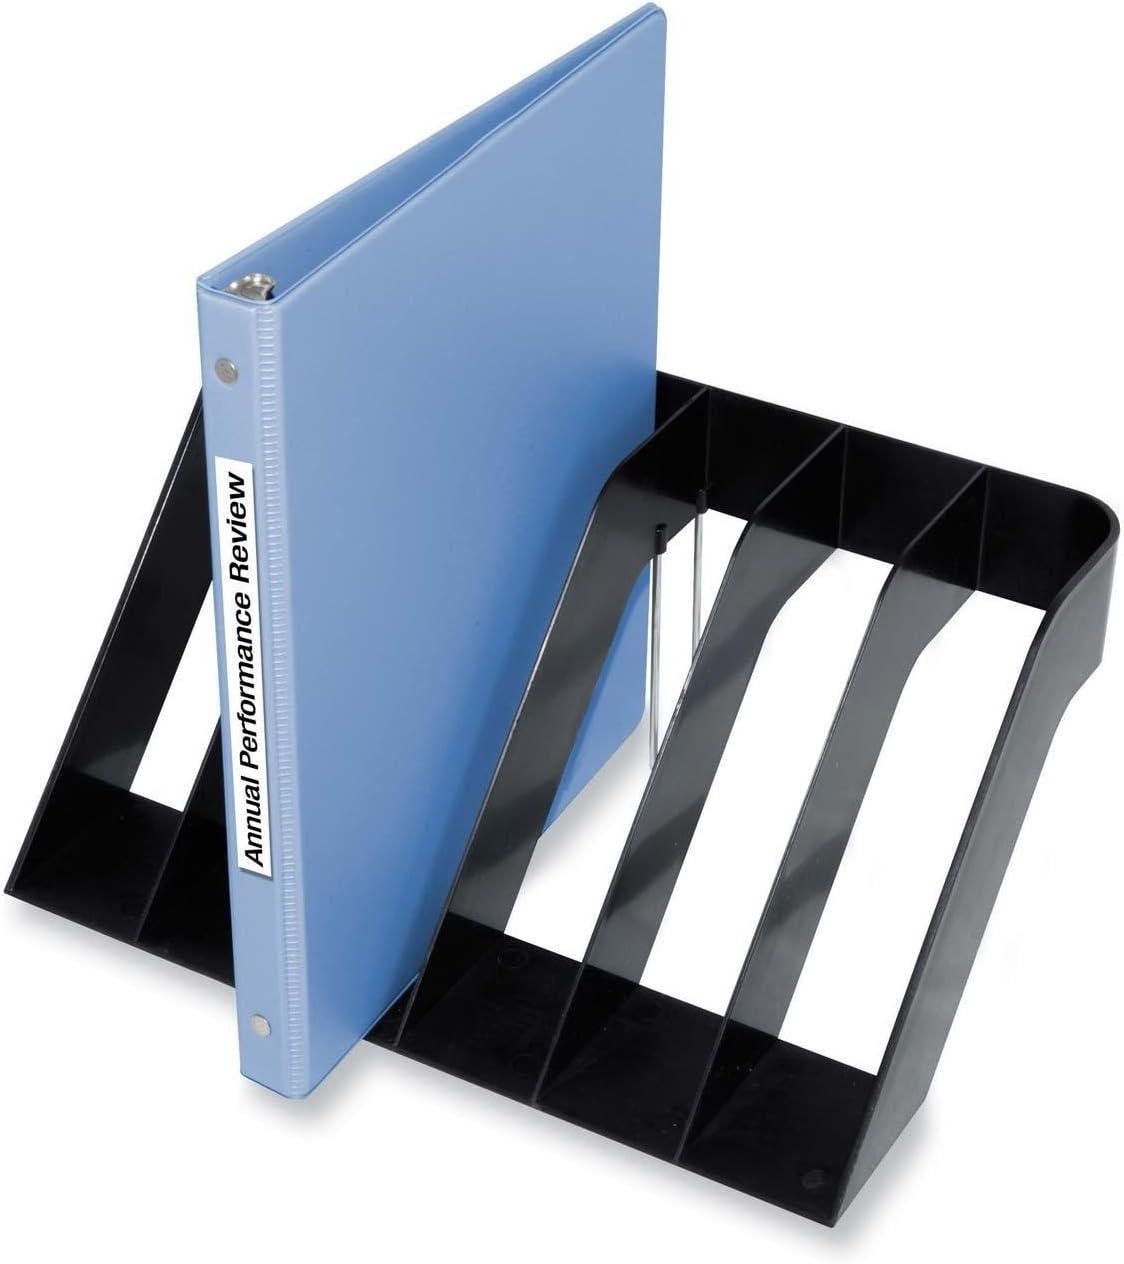 Kantek 6-Section Wide Sorter, 13-Inch Wide x 8.5-Inch Deep x 6-Inch High, Black (S1510)